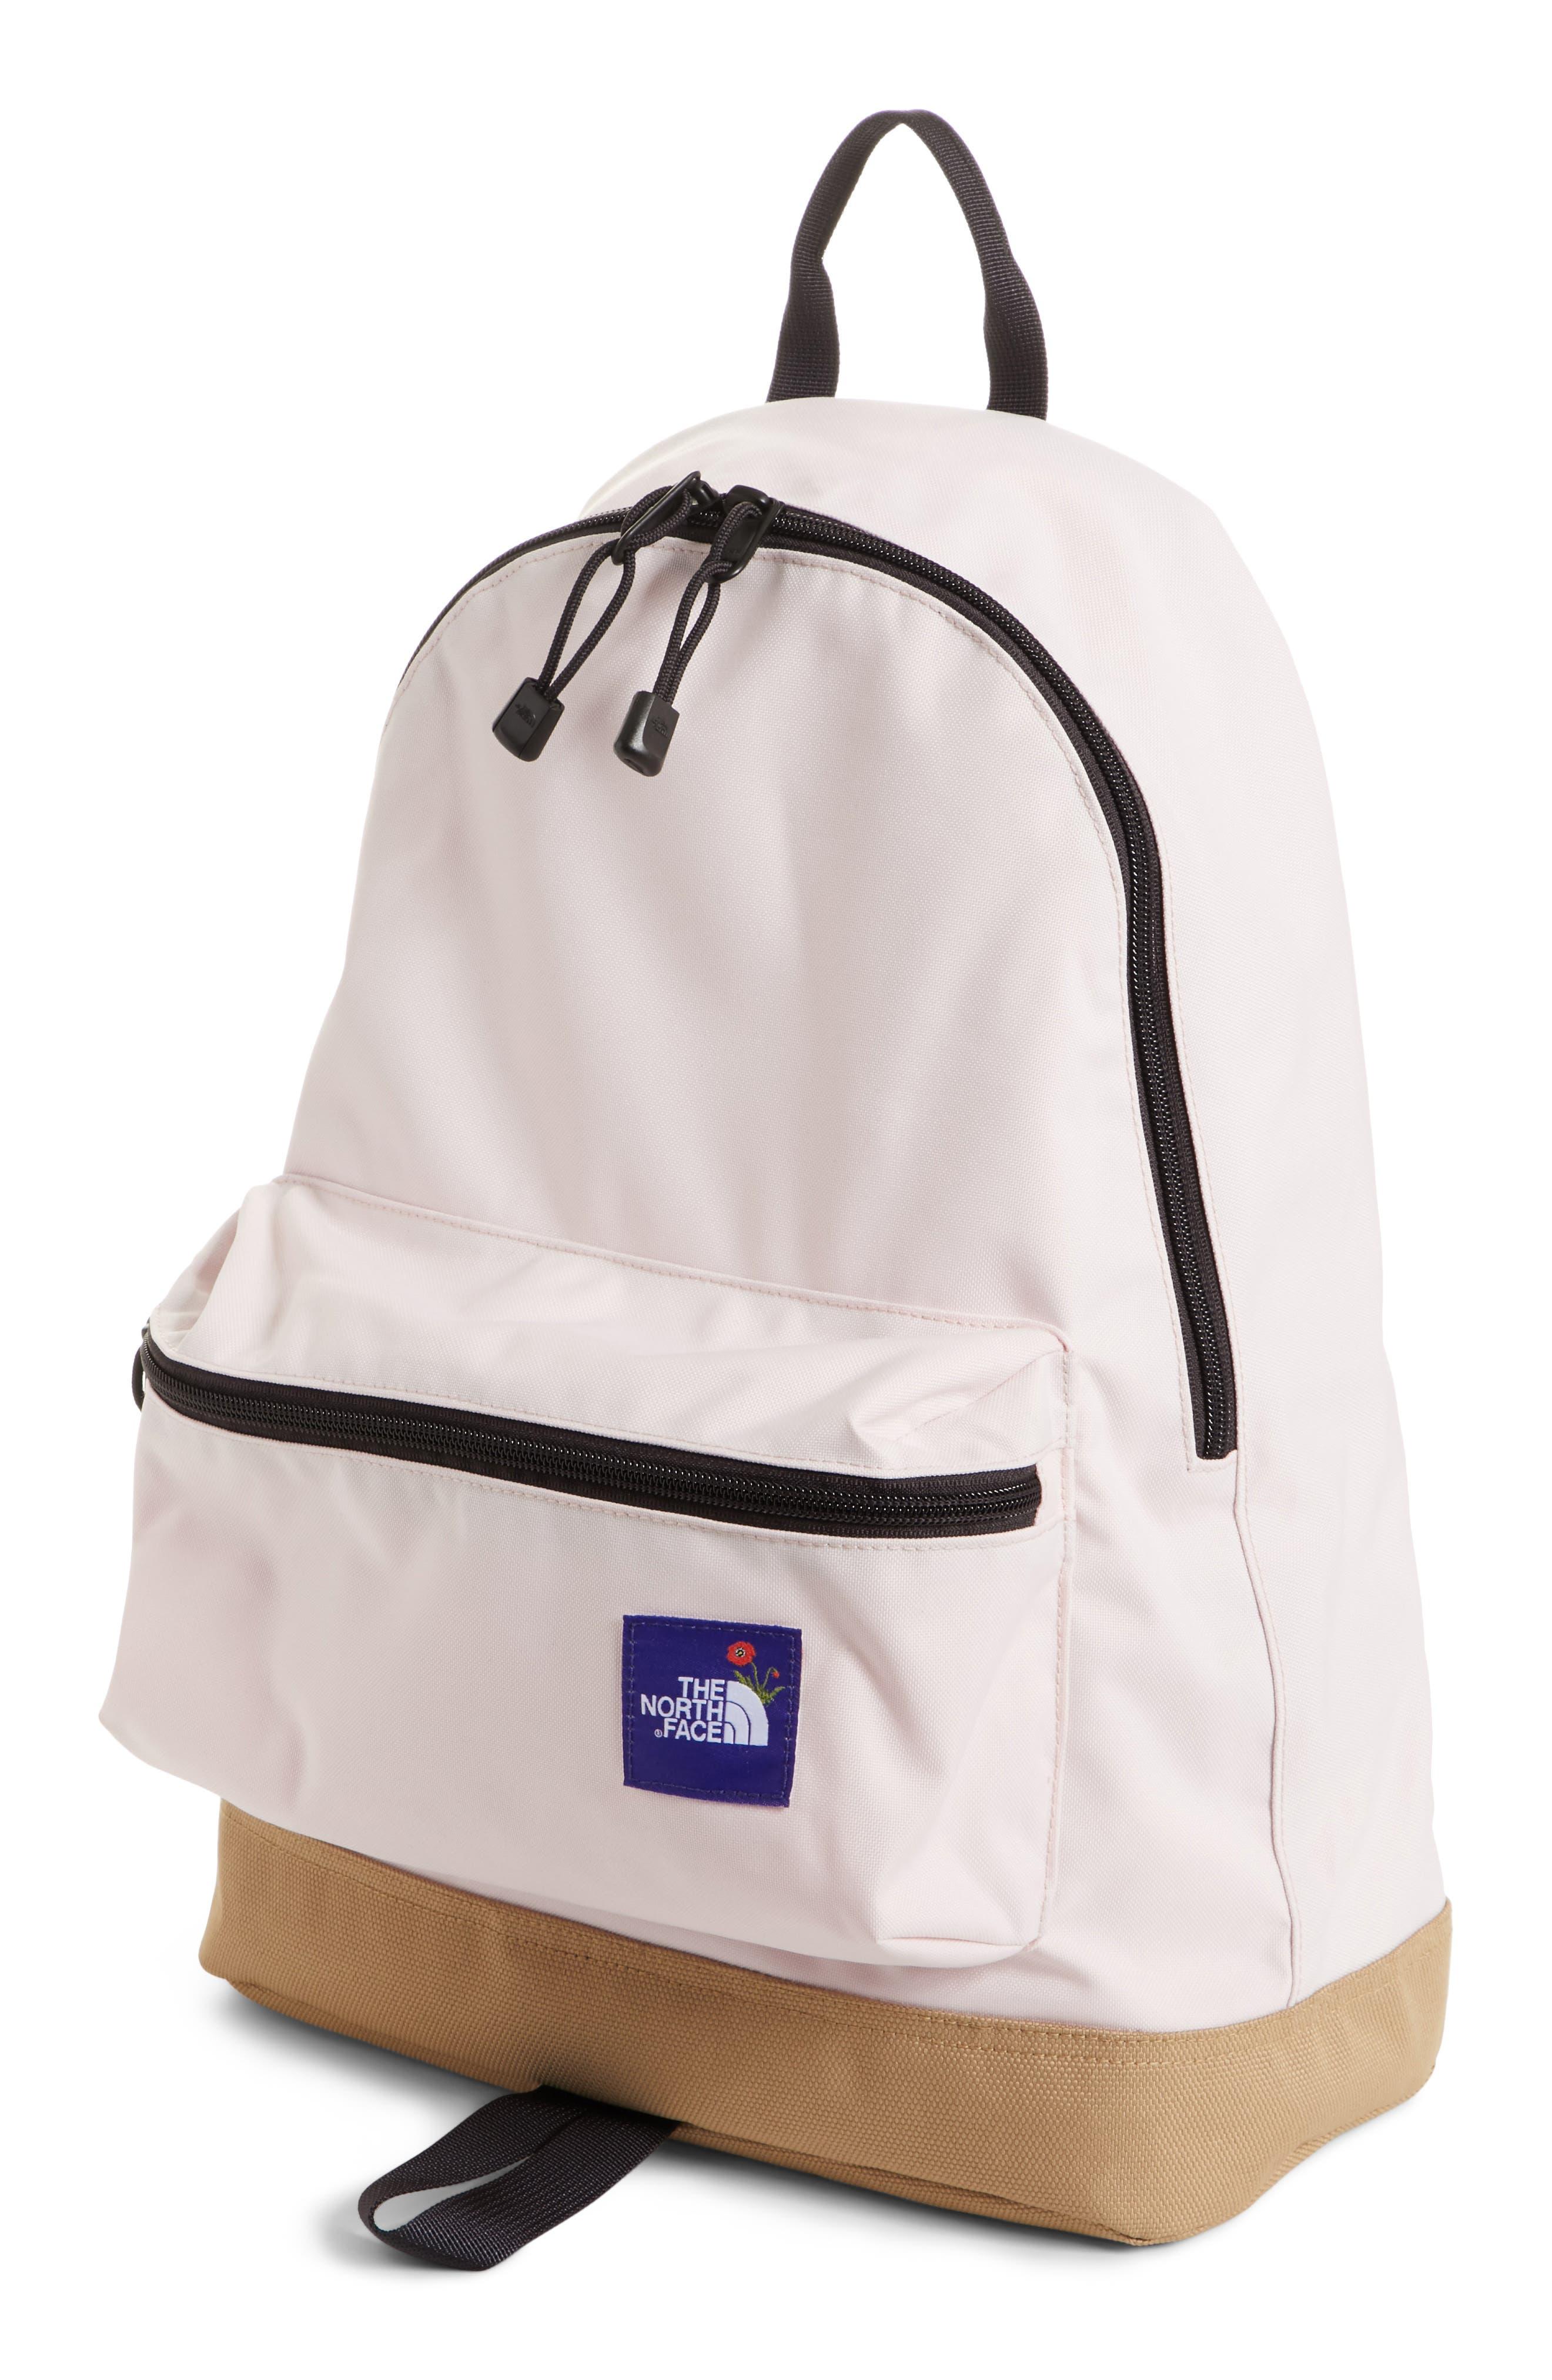 The North Face Mini OK Berkeley Backpack